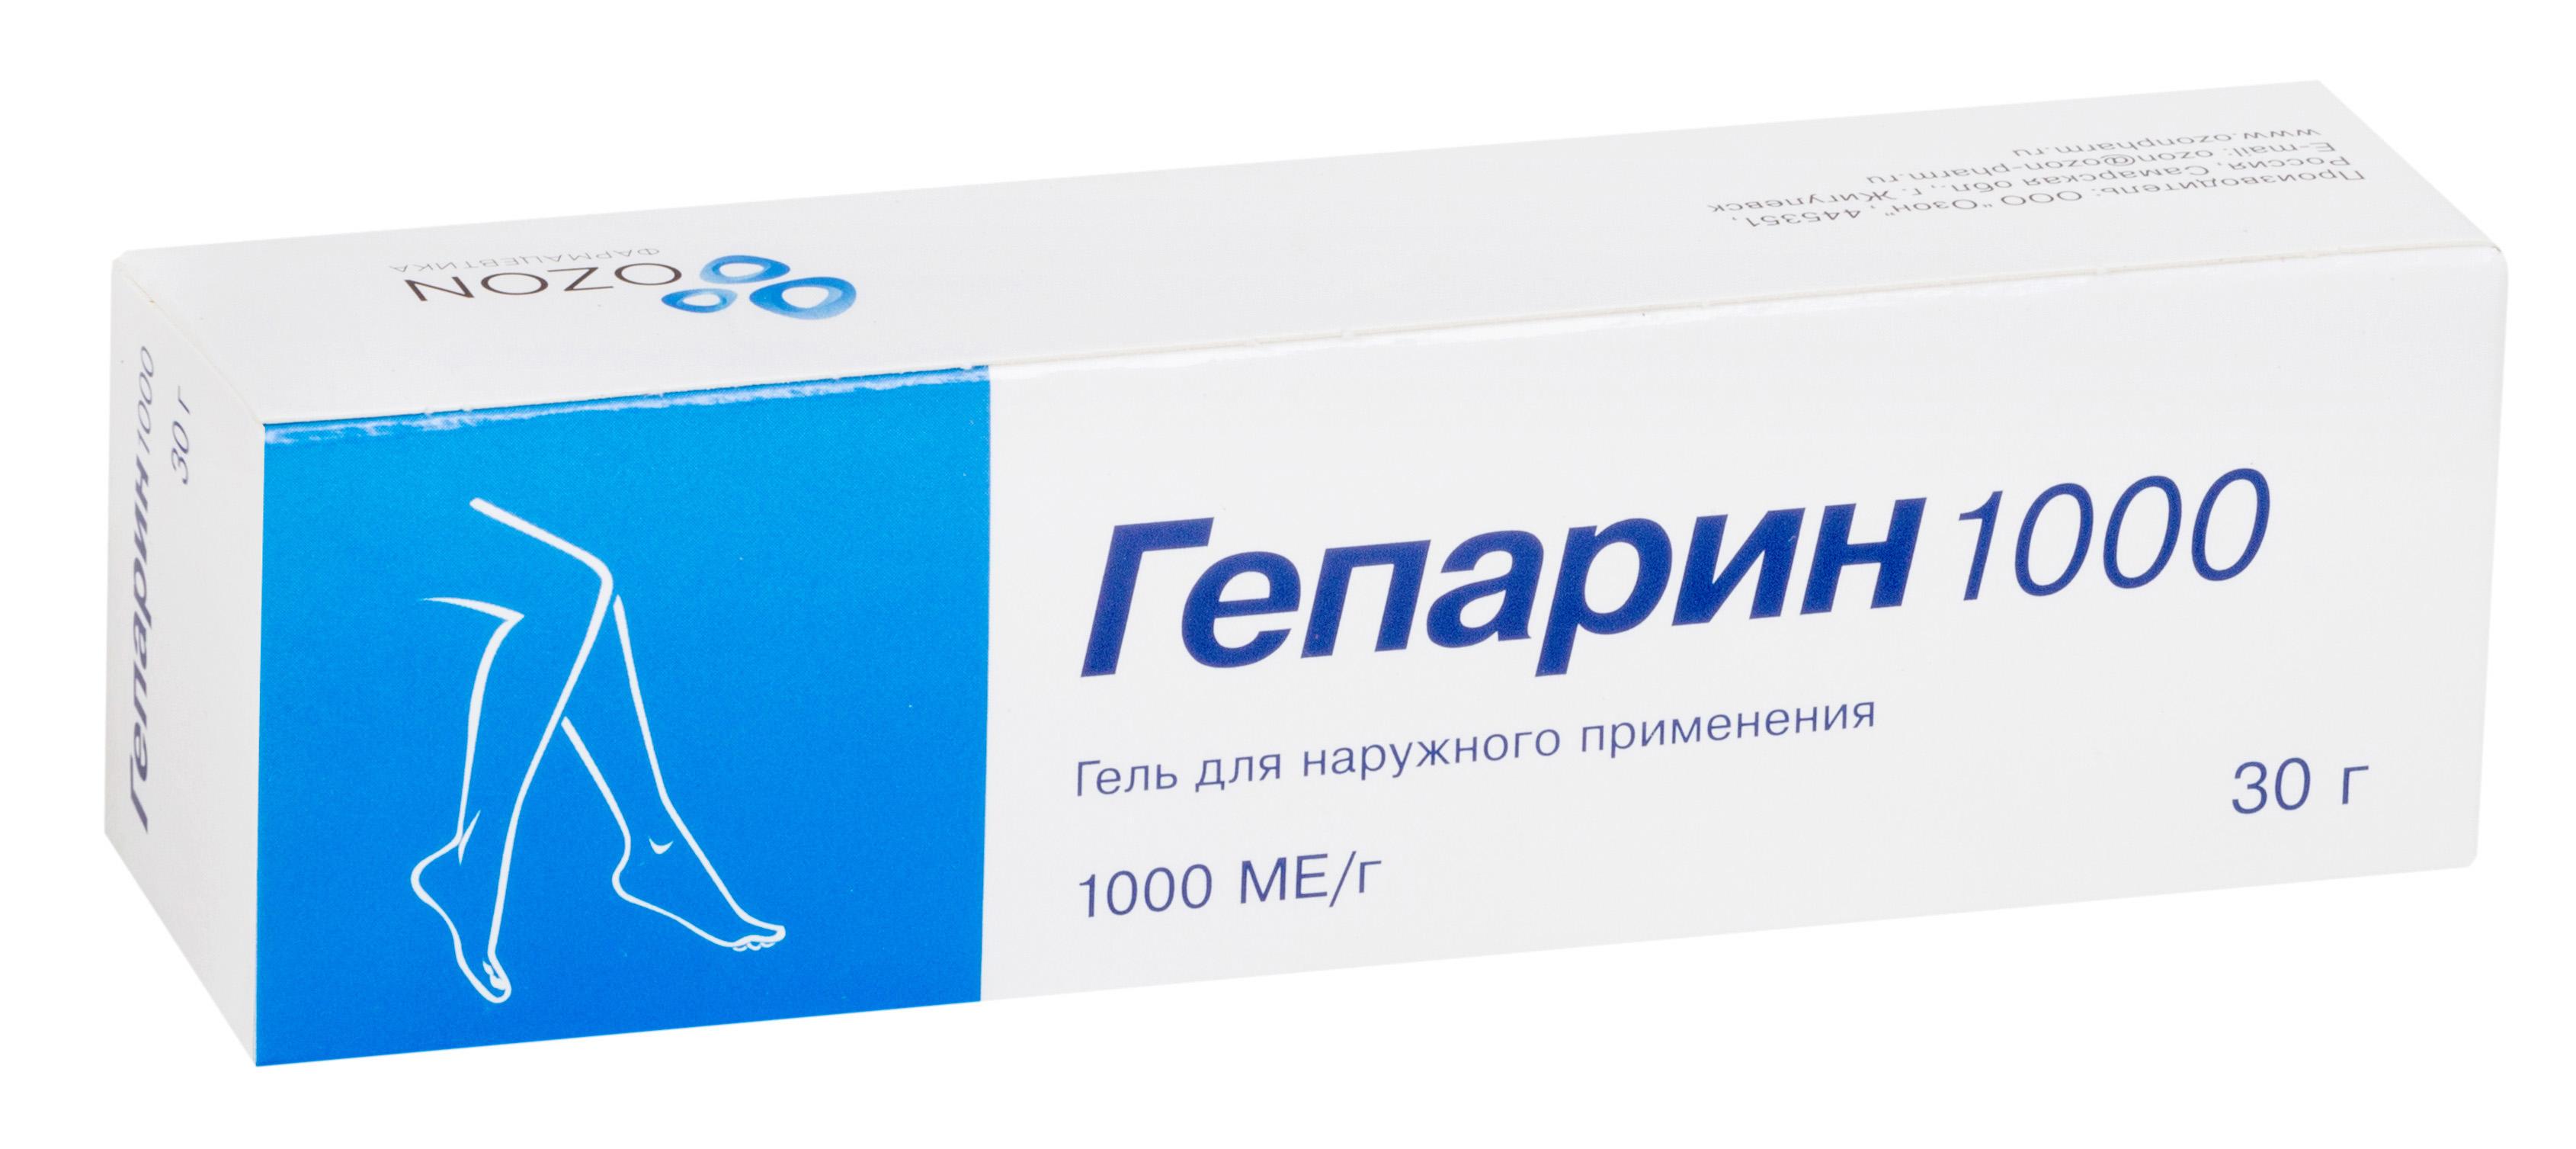 Гепарин 1000 гель д/наруж. прим. 1000 ме/г 30г